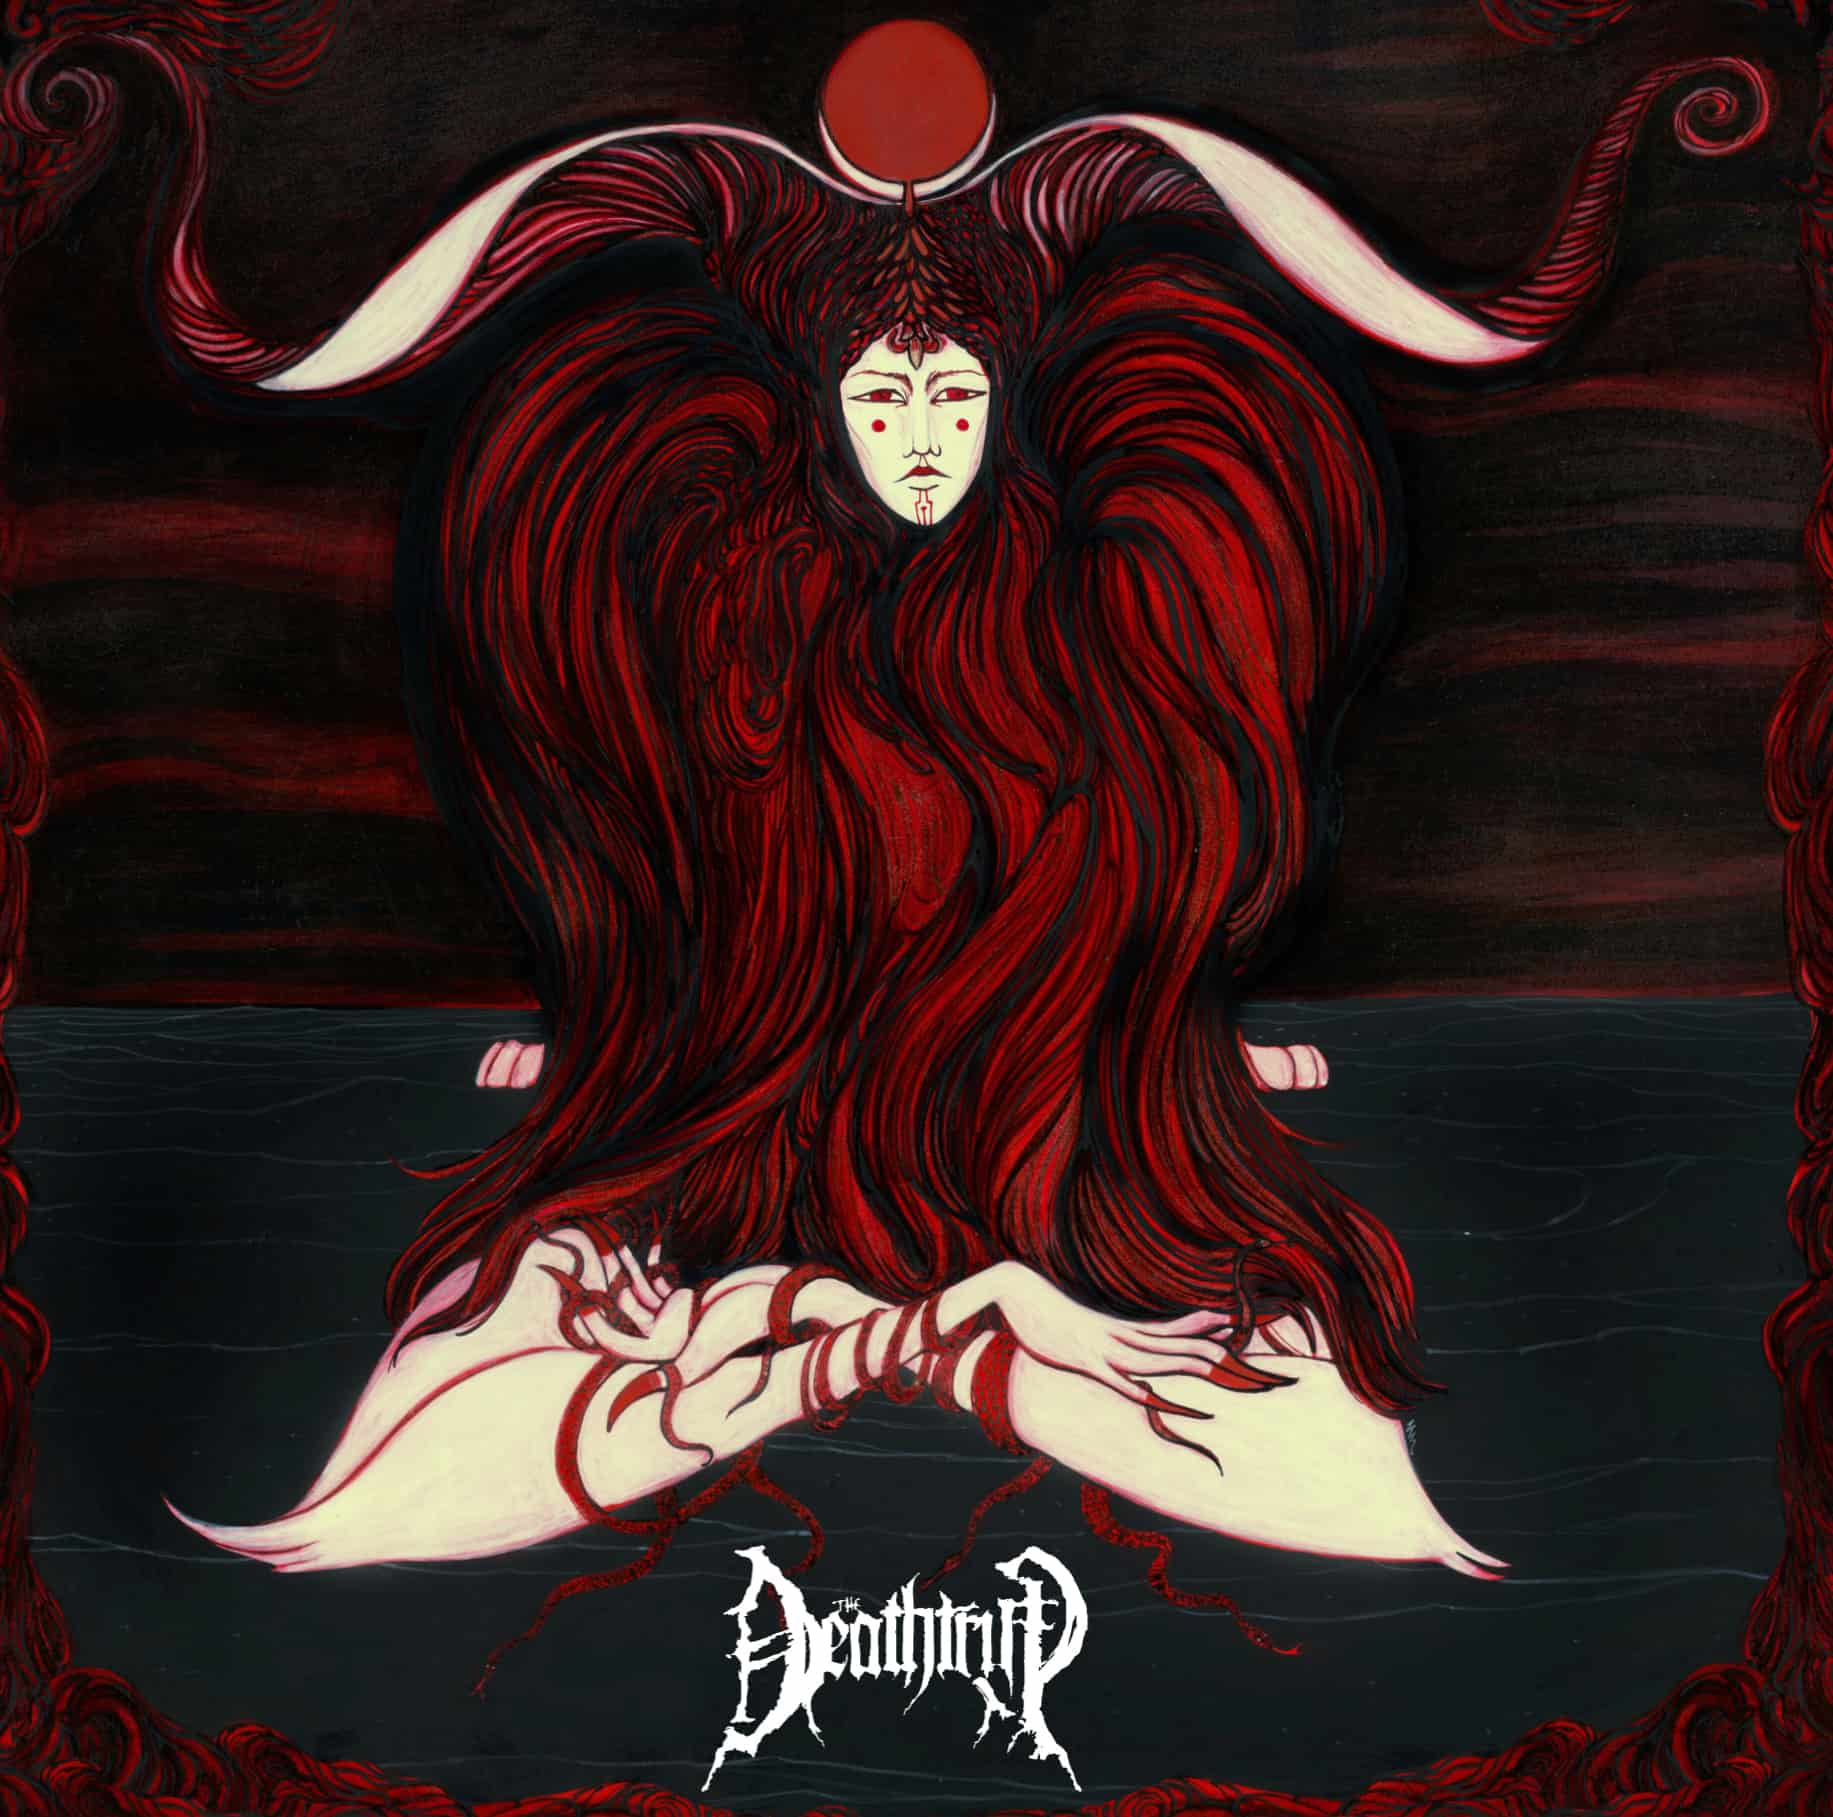 DeathTrip-DEMON-SOLAR-TOTEM-COVER-ART